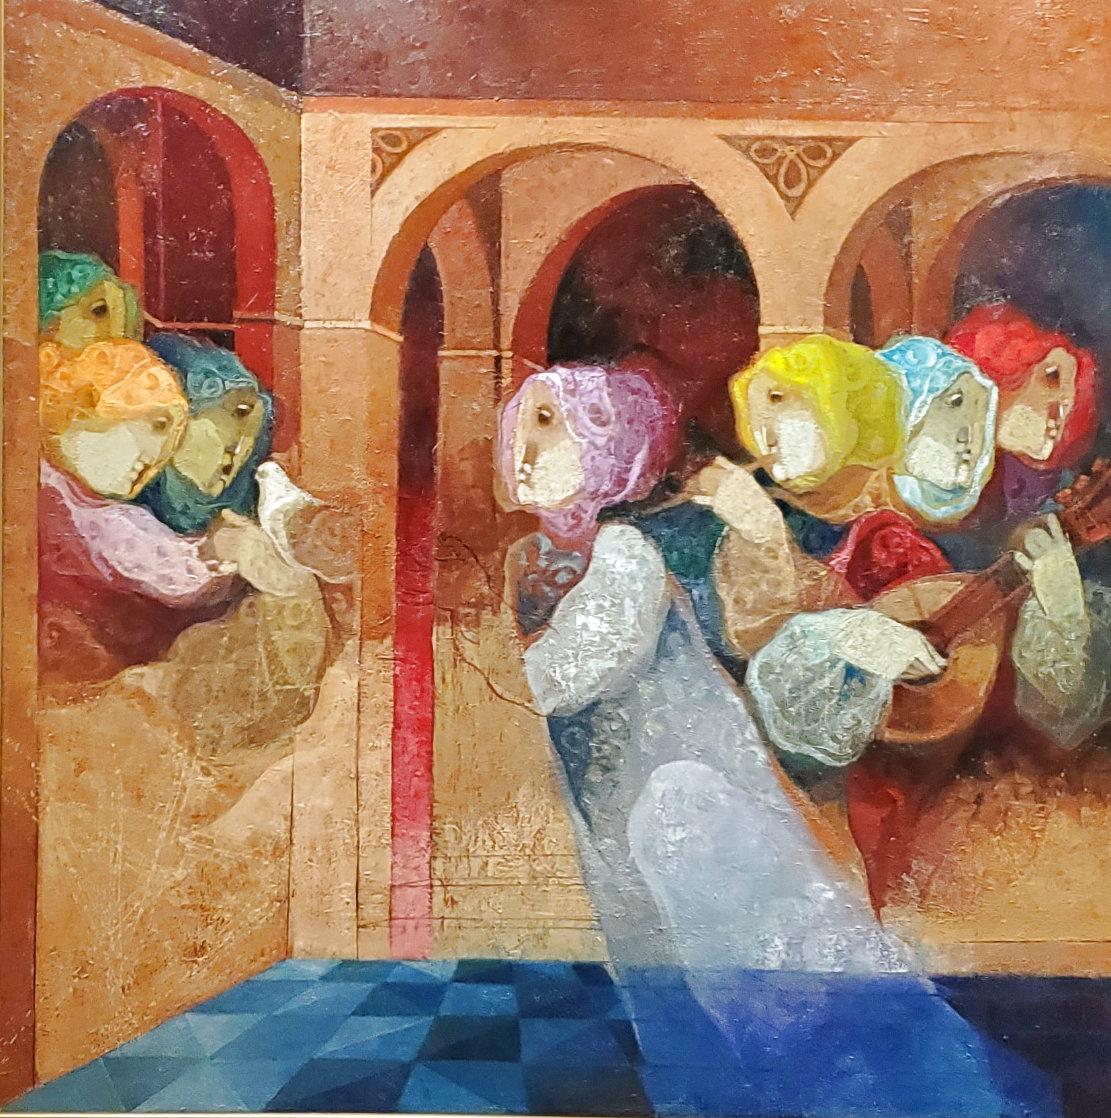 Musical Renaixent 59.5x59.5  Super Huge  Original Painting by Sunol Alvar